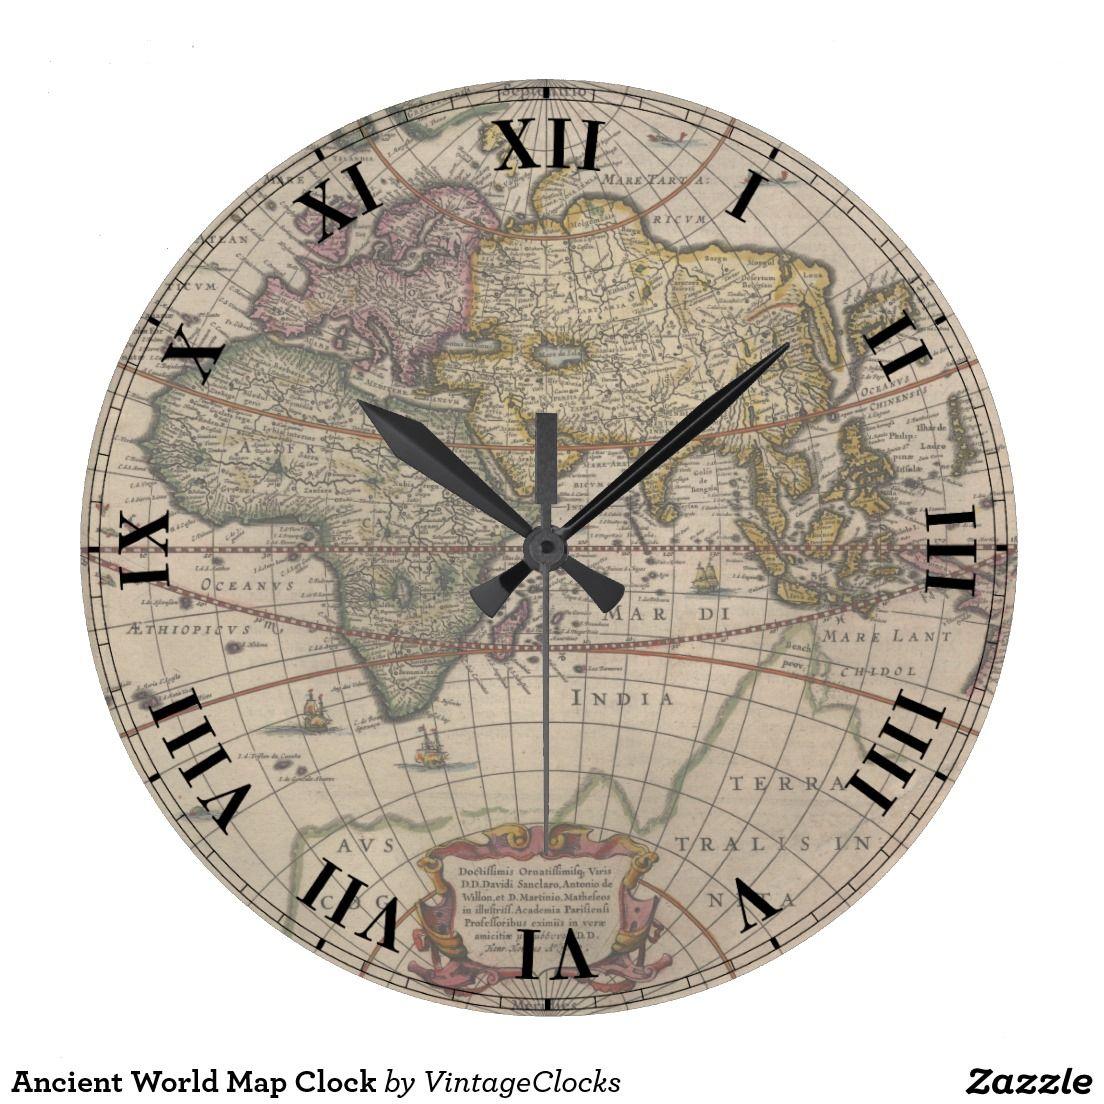 Ancient world map clock world clock and world maps ancient world map clock gumiabroncs Image collections